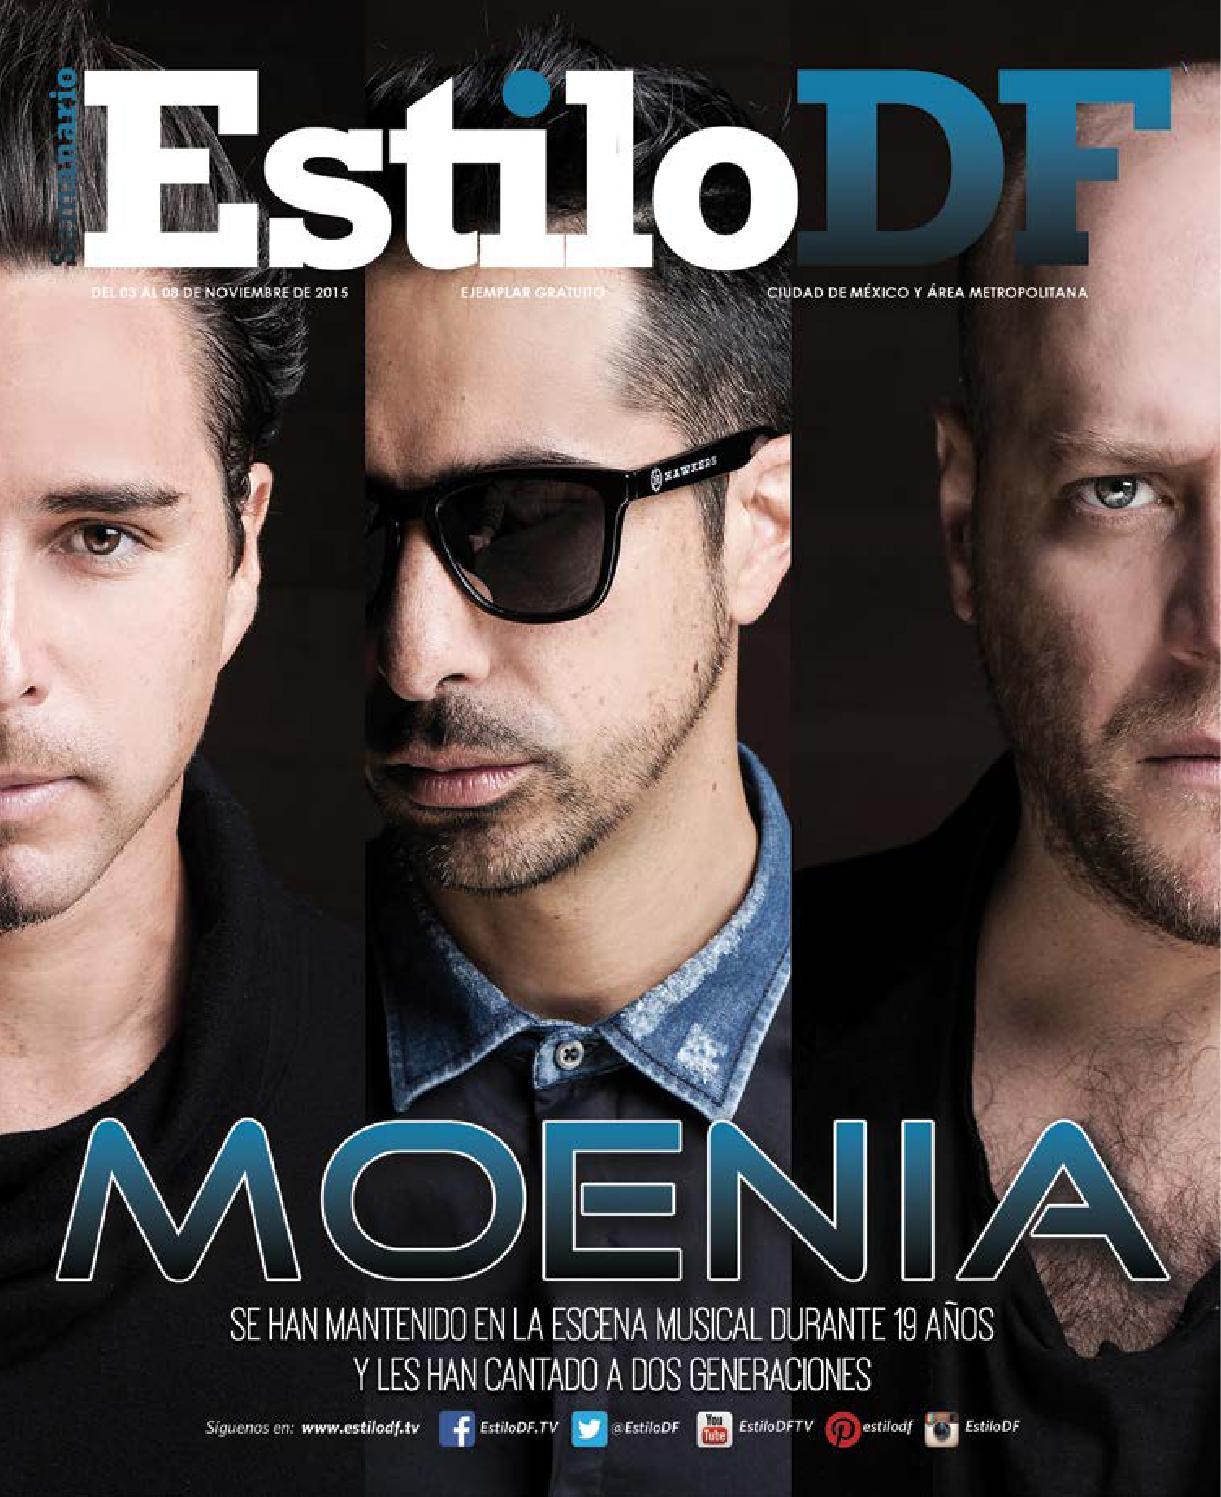 d7a29e92fe EstiloDF Moenia 3 de octubre by EstiloDF - issuu